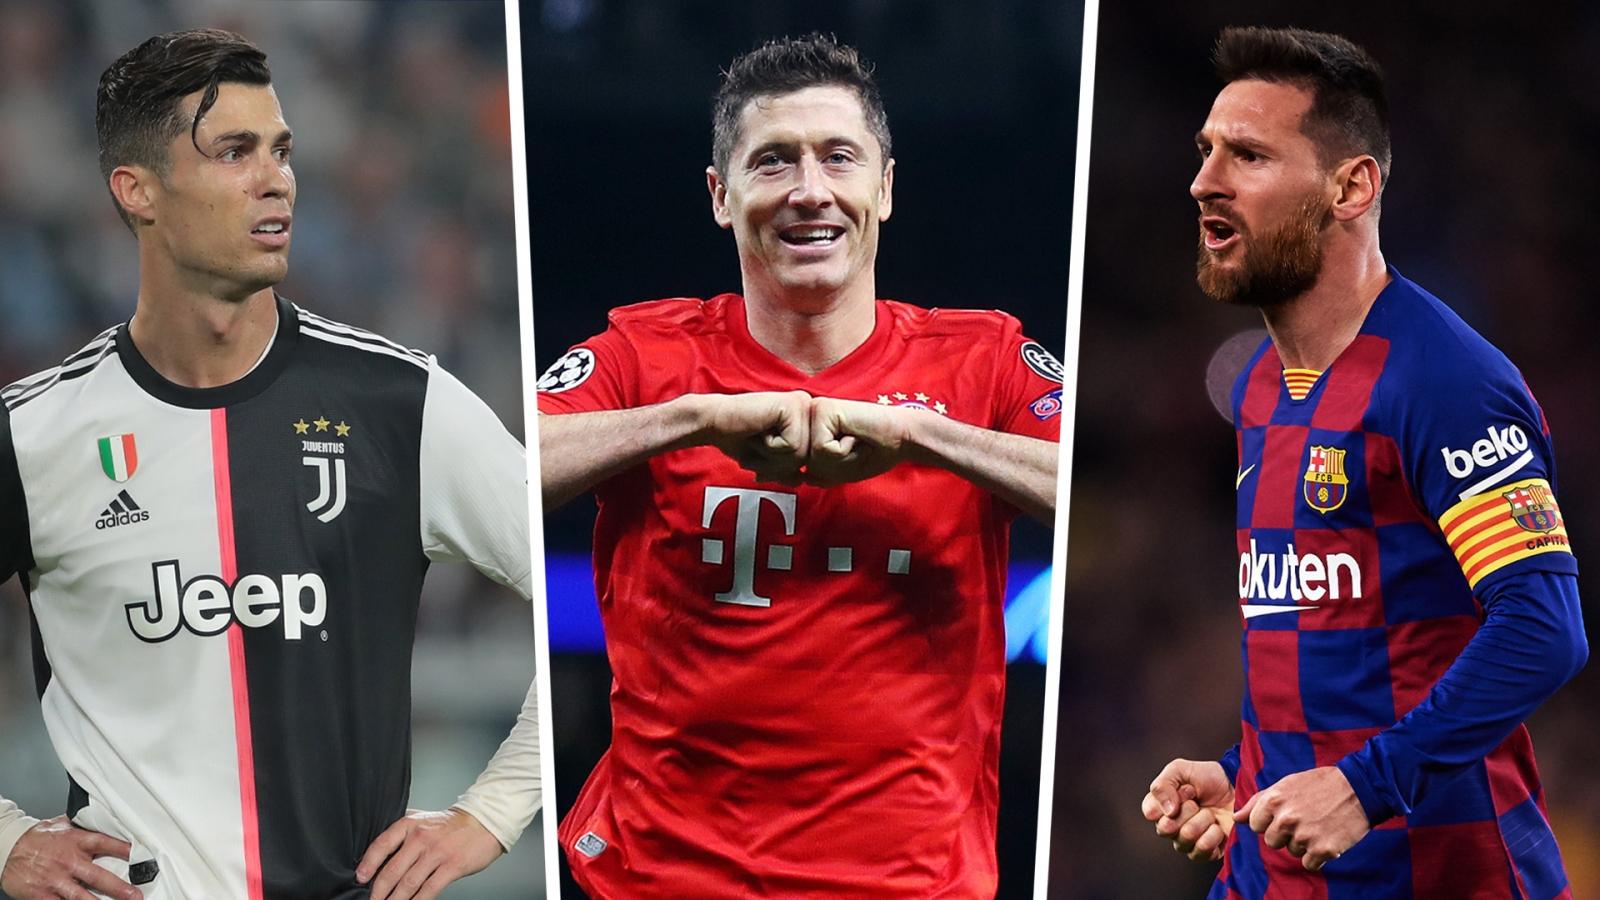 Ronaldo, Messi tranh giải The Best với Lewandowski